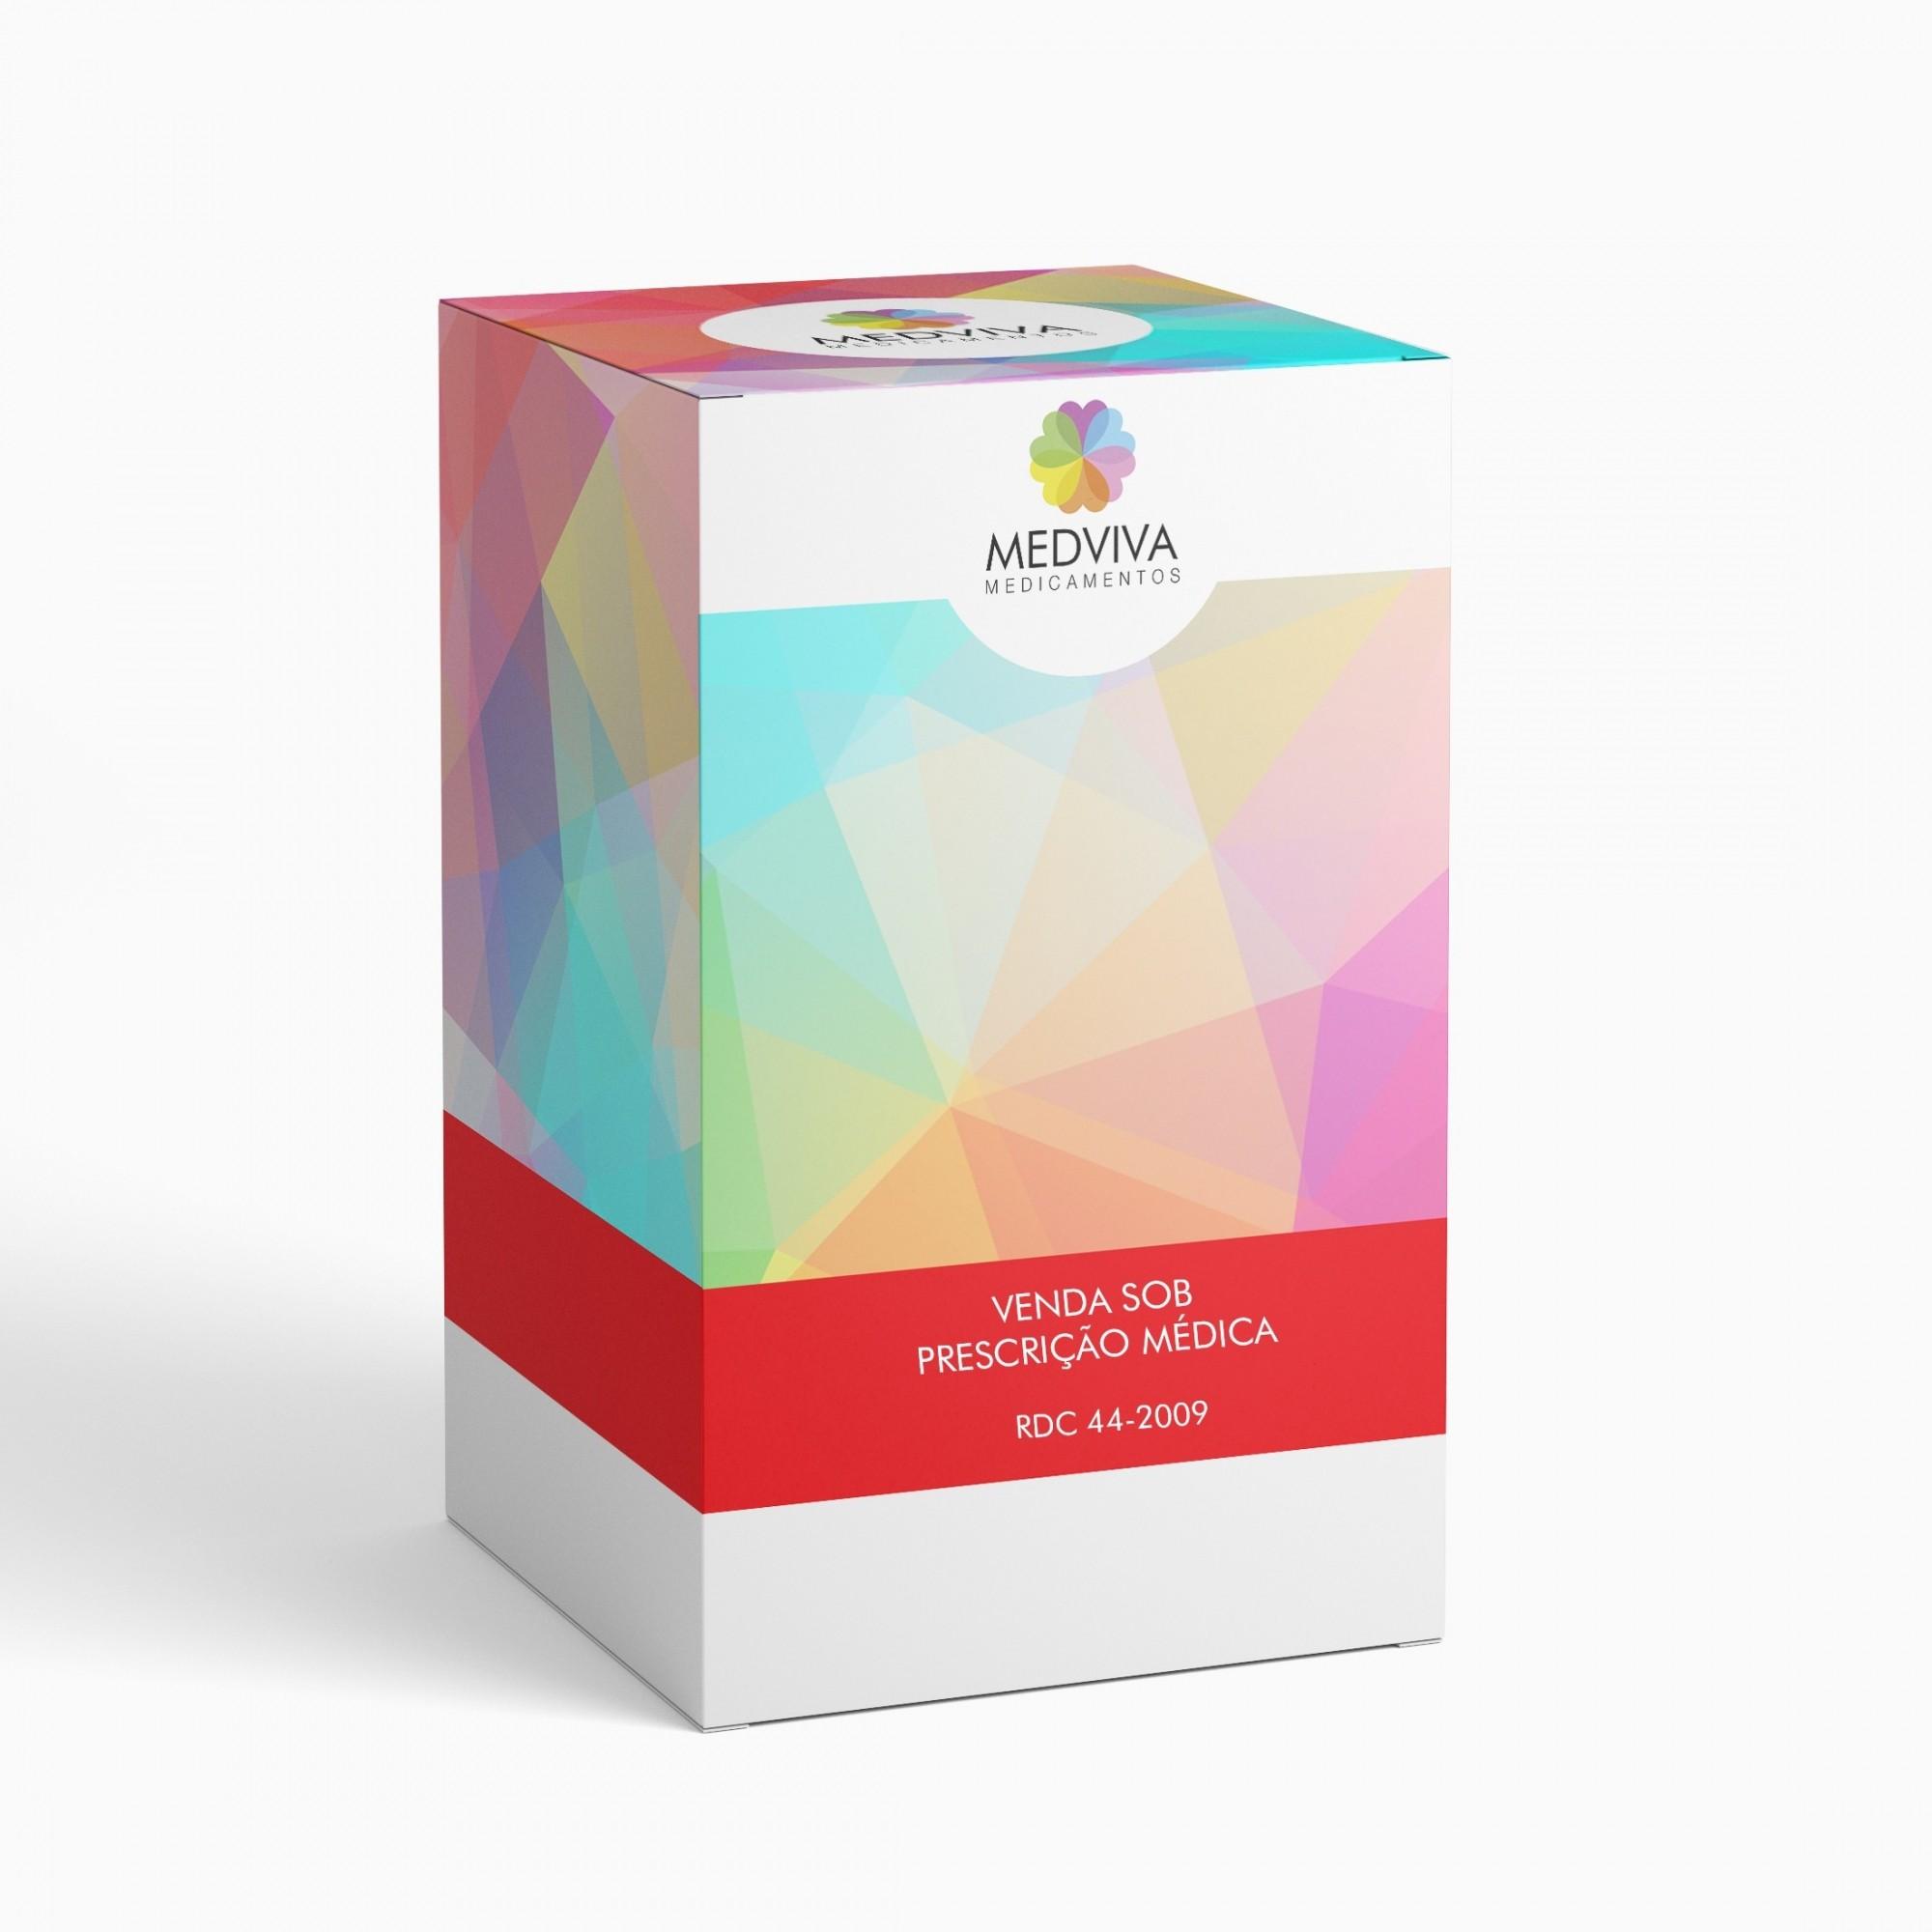 Avastin 100mg - 25mg/ml - 4 ml Roche